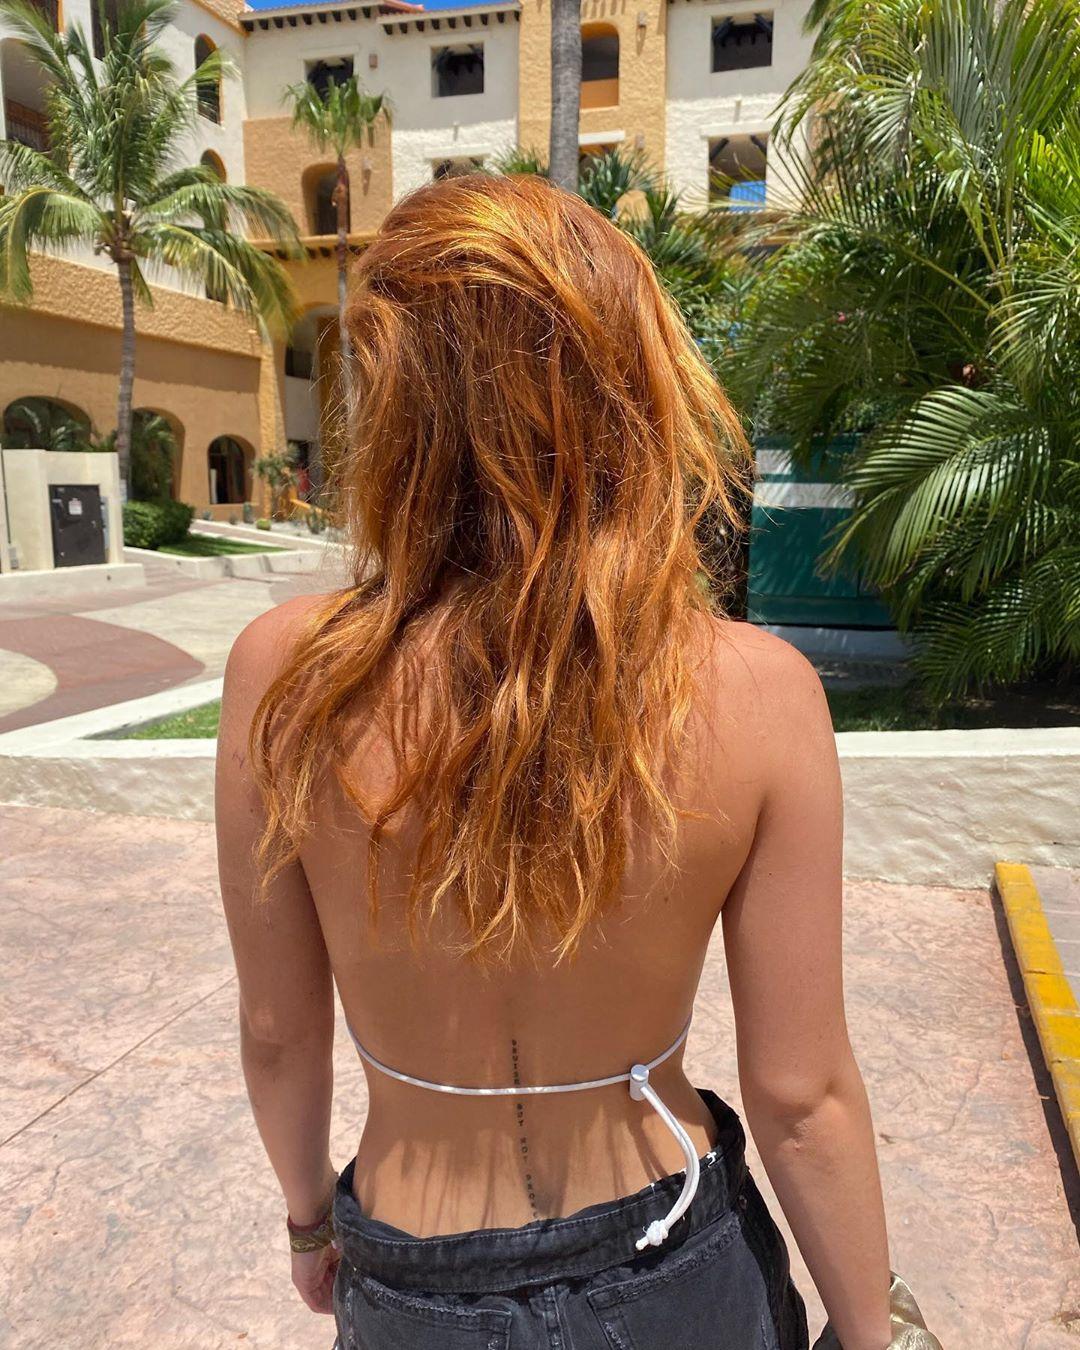 BellaThorne_CaboSanLucas11